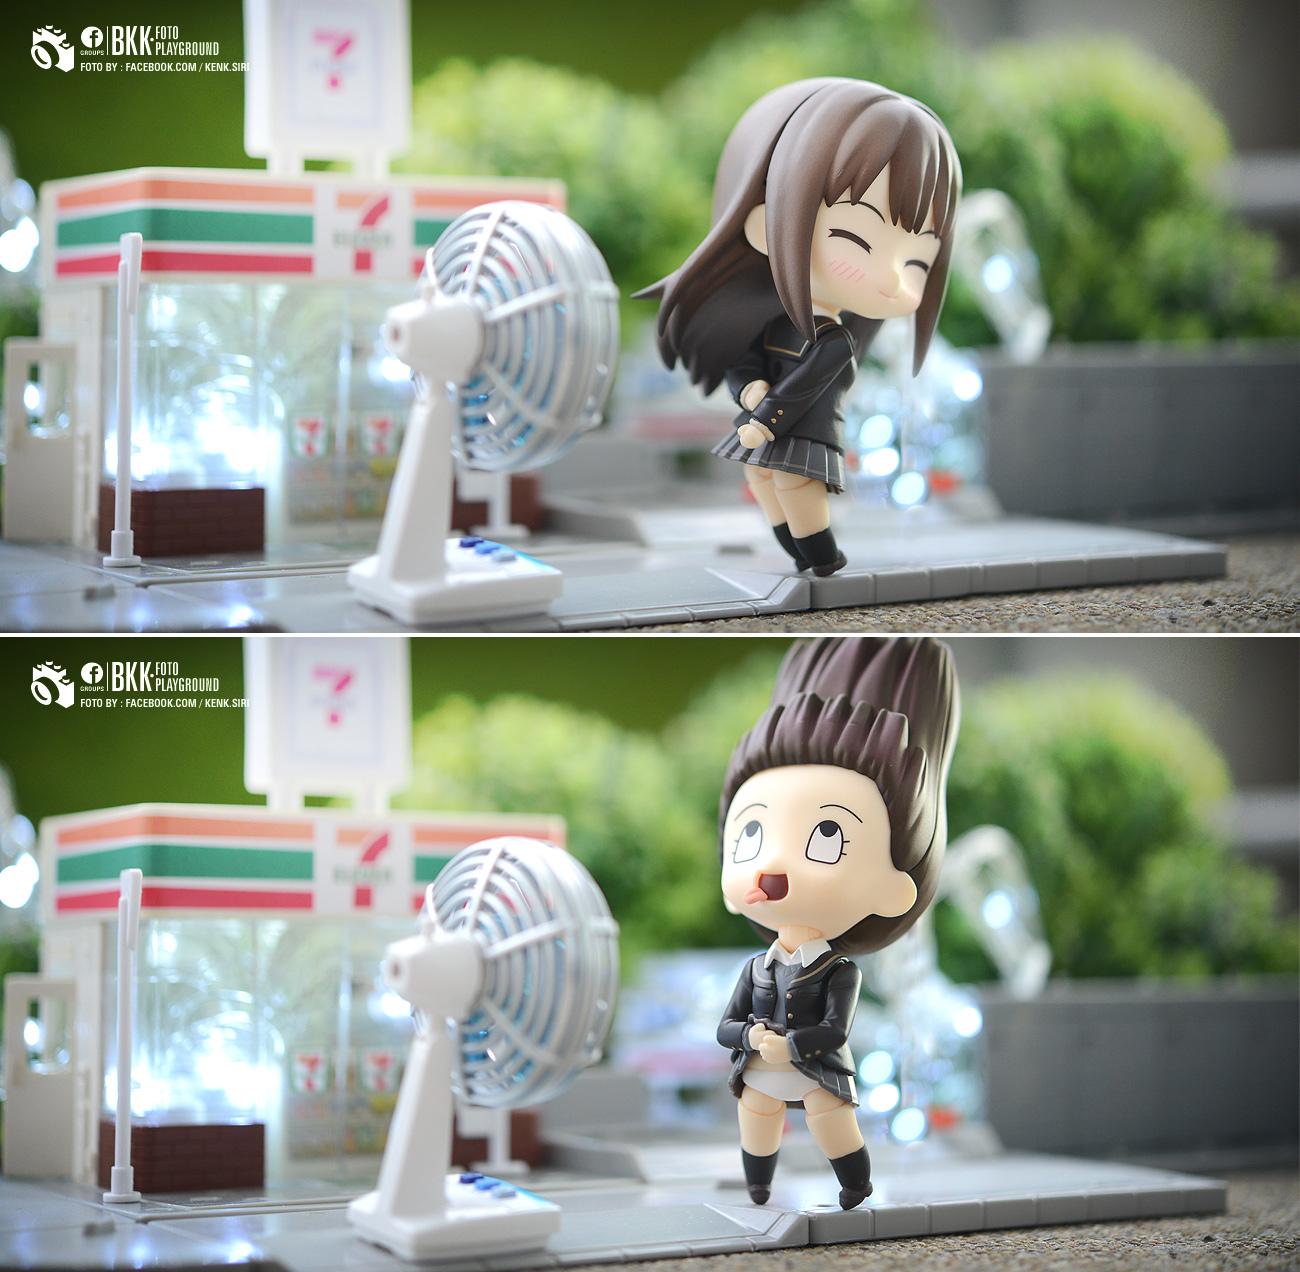 fan model figure nendoroid max_factory rin anime figurine good_smile_company figures toys working!! cartoon nendoron ageta_yukiwo abe_masato amagami_ss yamada_aoi nanasaki_ai hachioto +tic_neesan neesan idolm@ster_cinderella_girls shibuya_rin toyphotography thai manga, shibuya kenk.siri bandai_namco_entertainment_inc.